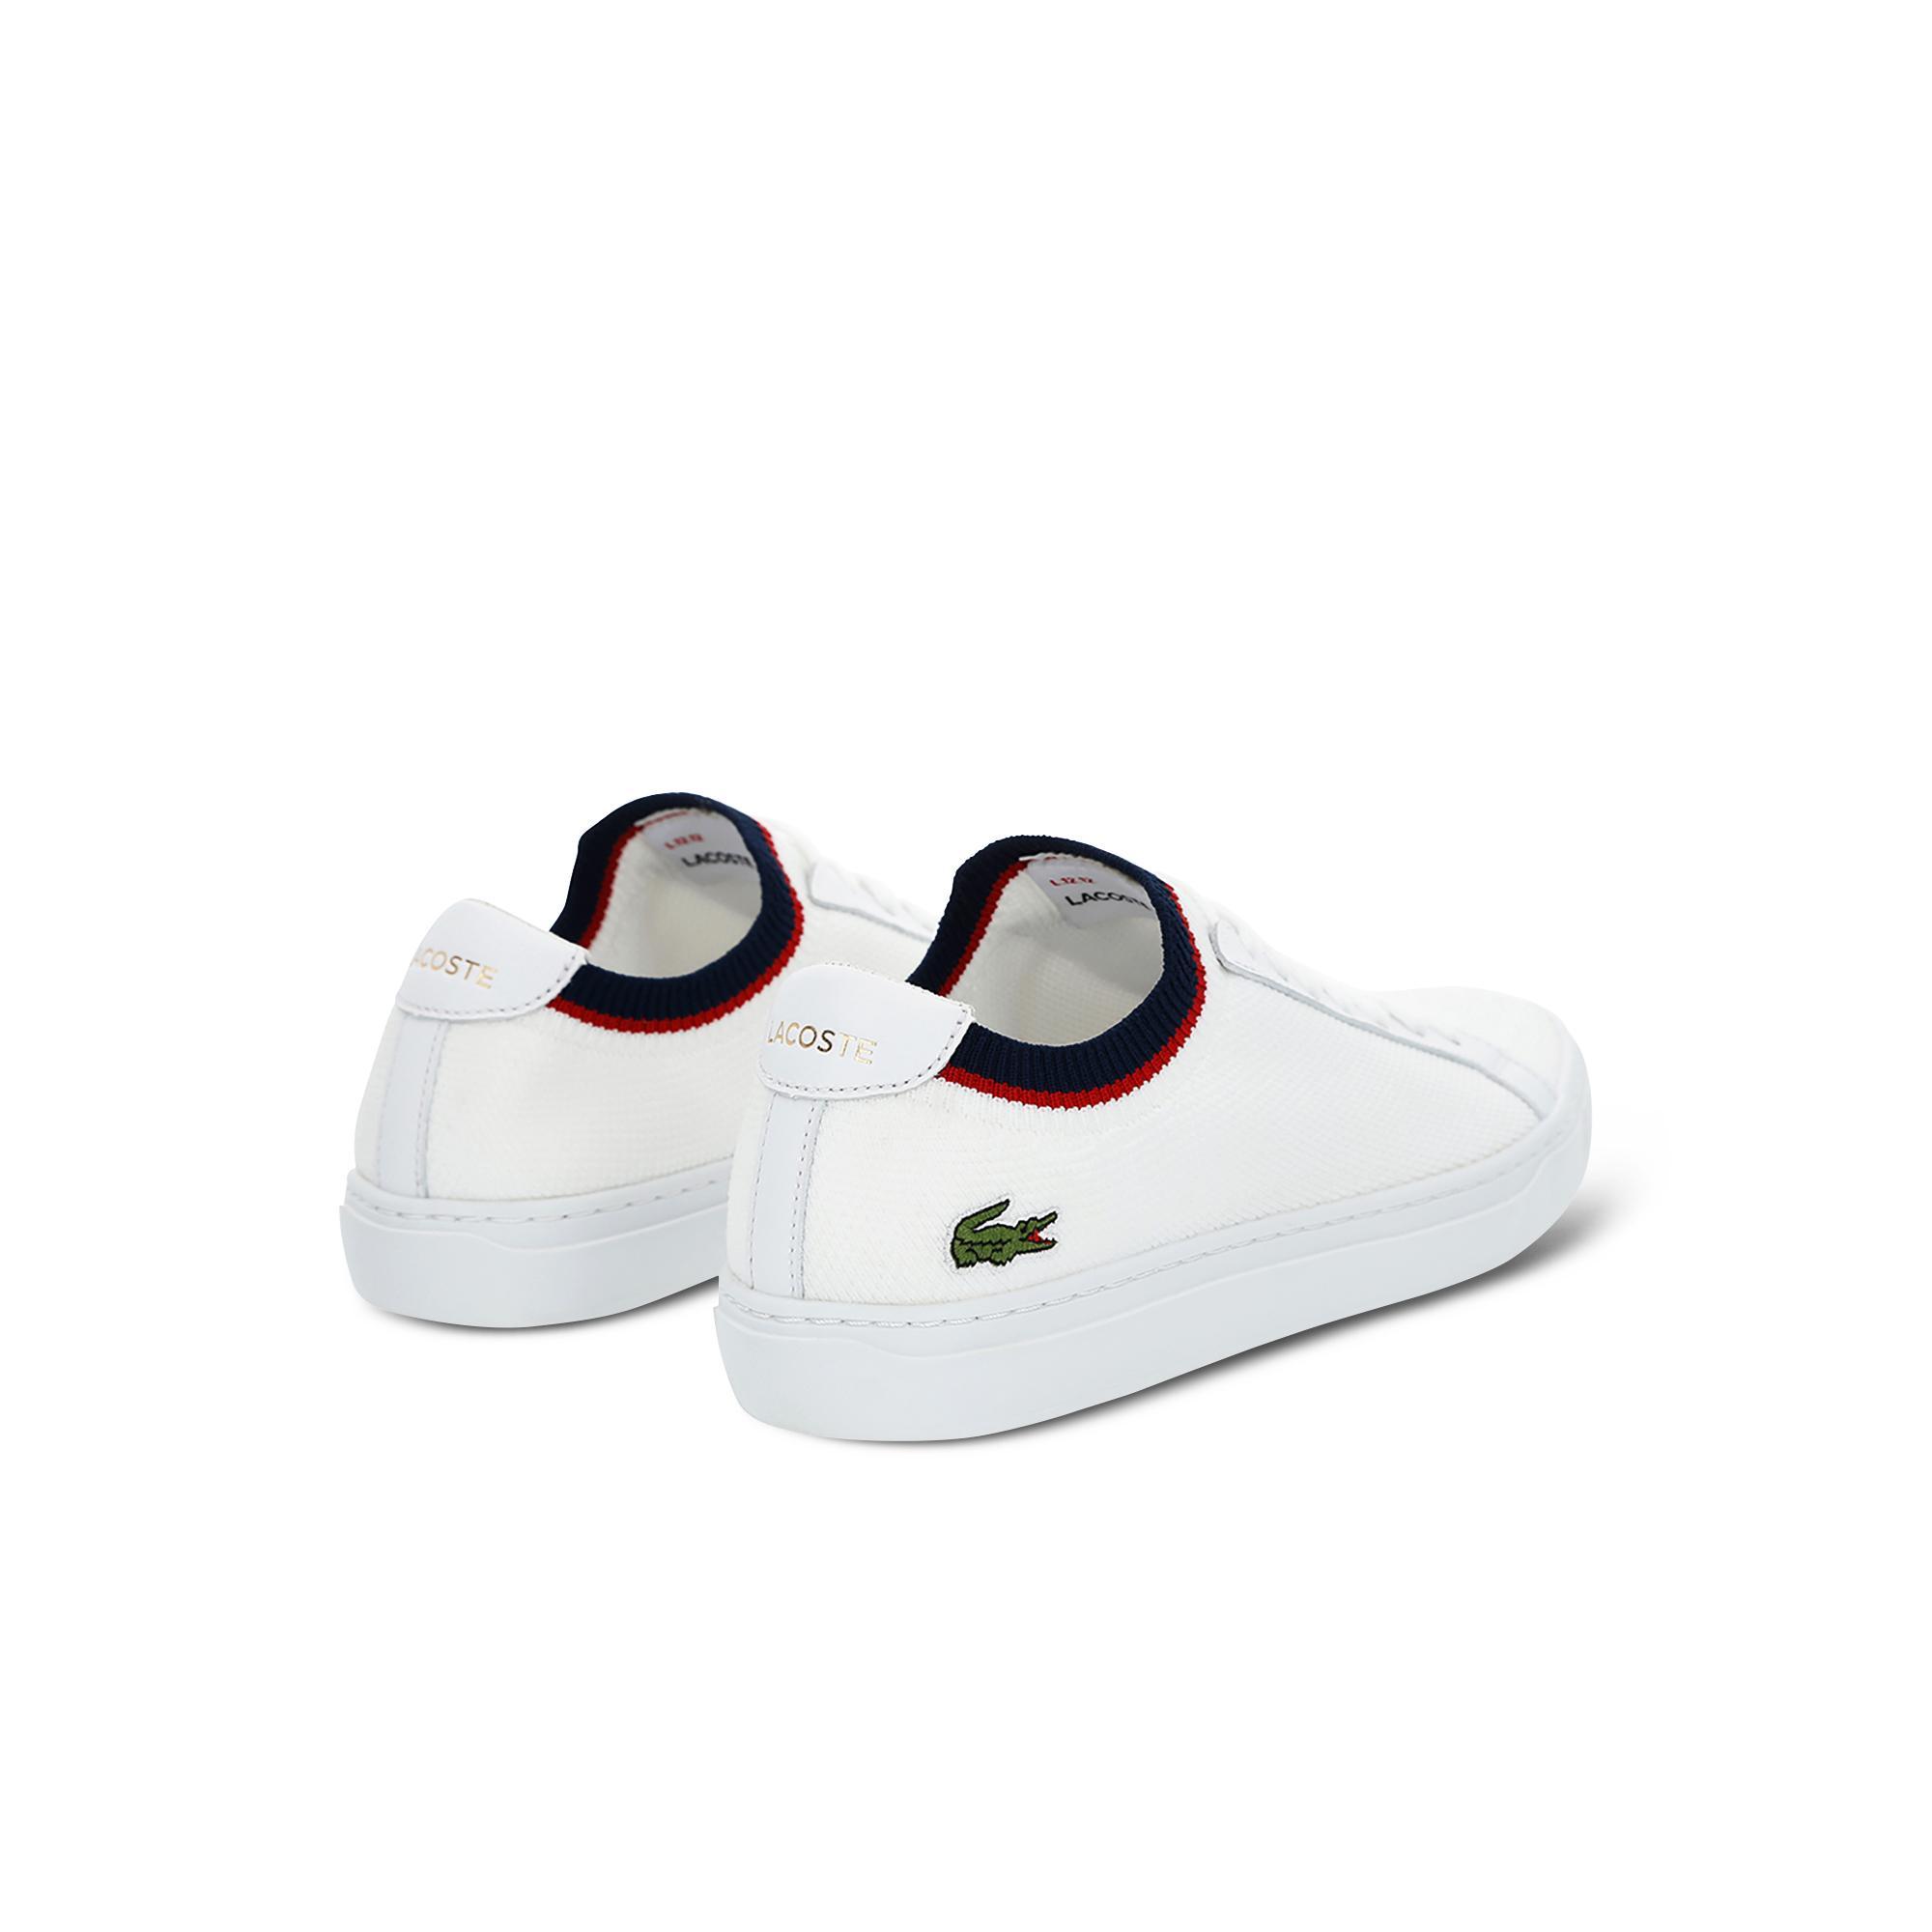 Lacoste Men's La Piquee 119 1 Cma Leather Sneakers